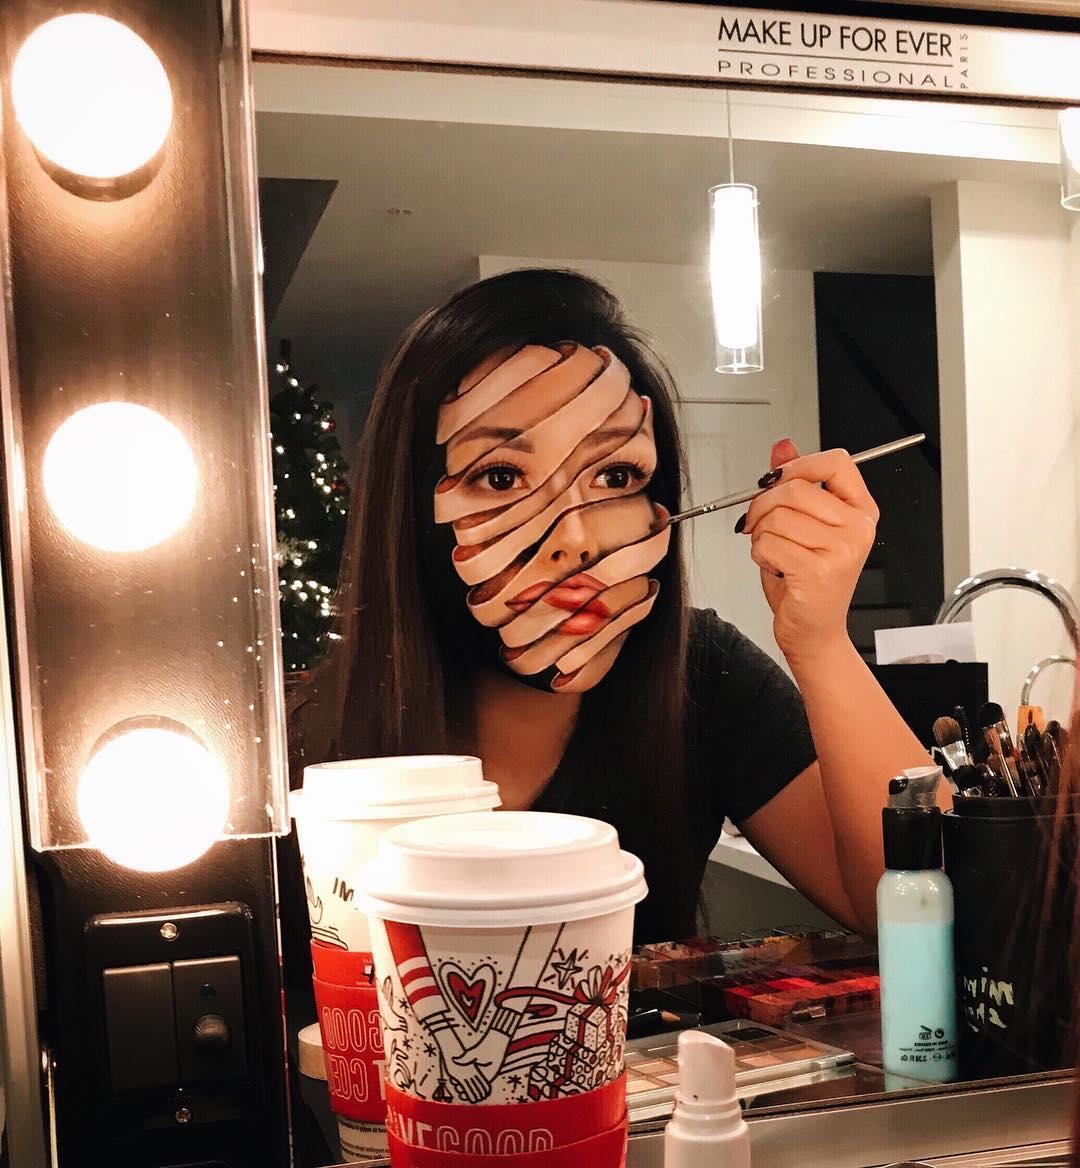 Mimi choi maquillaje ilusion optica (2)